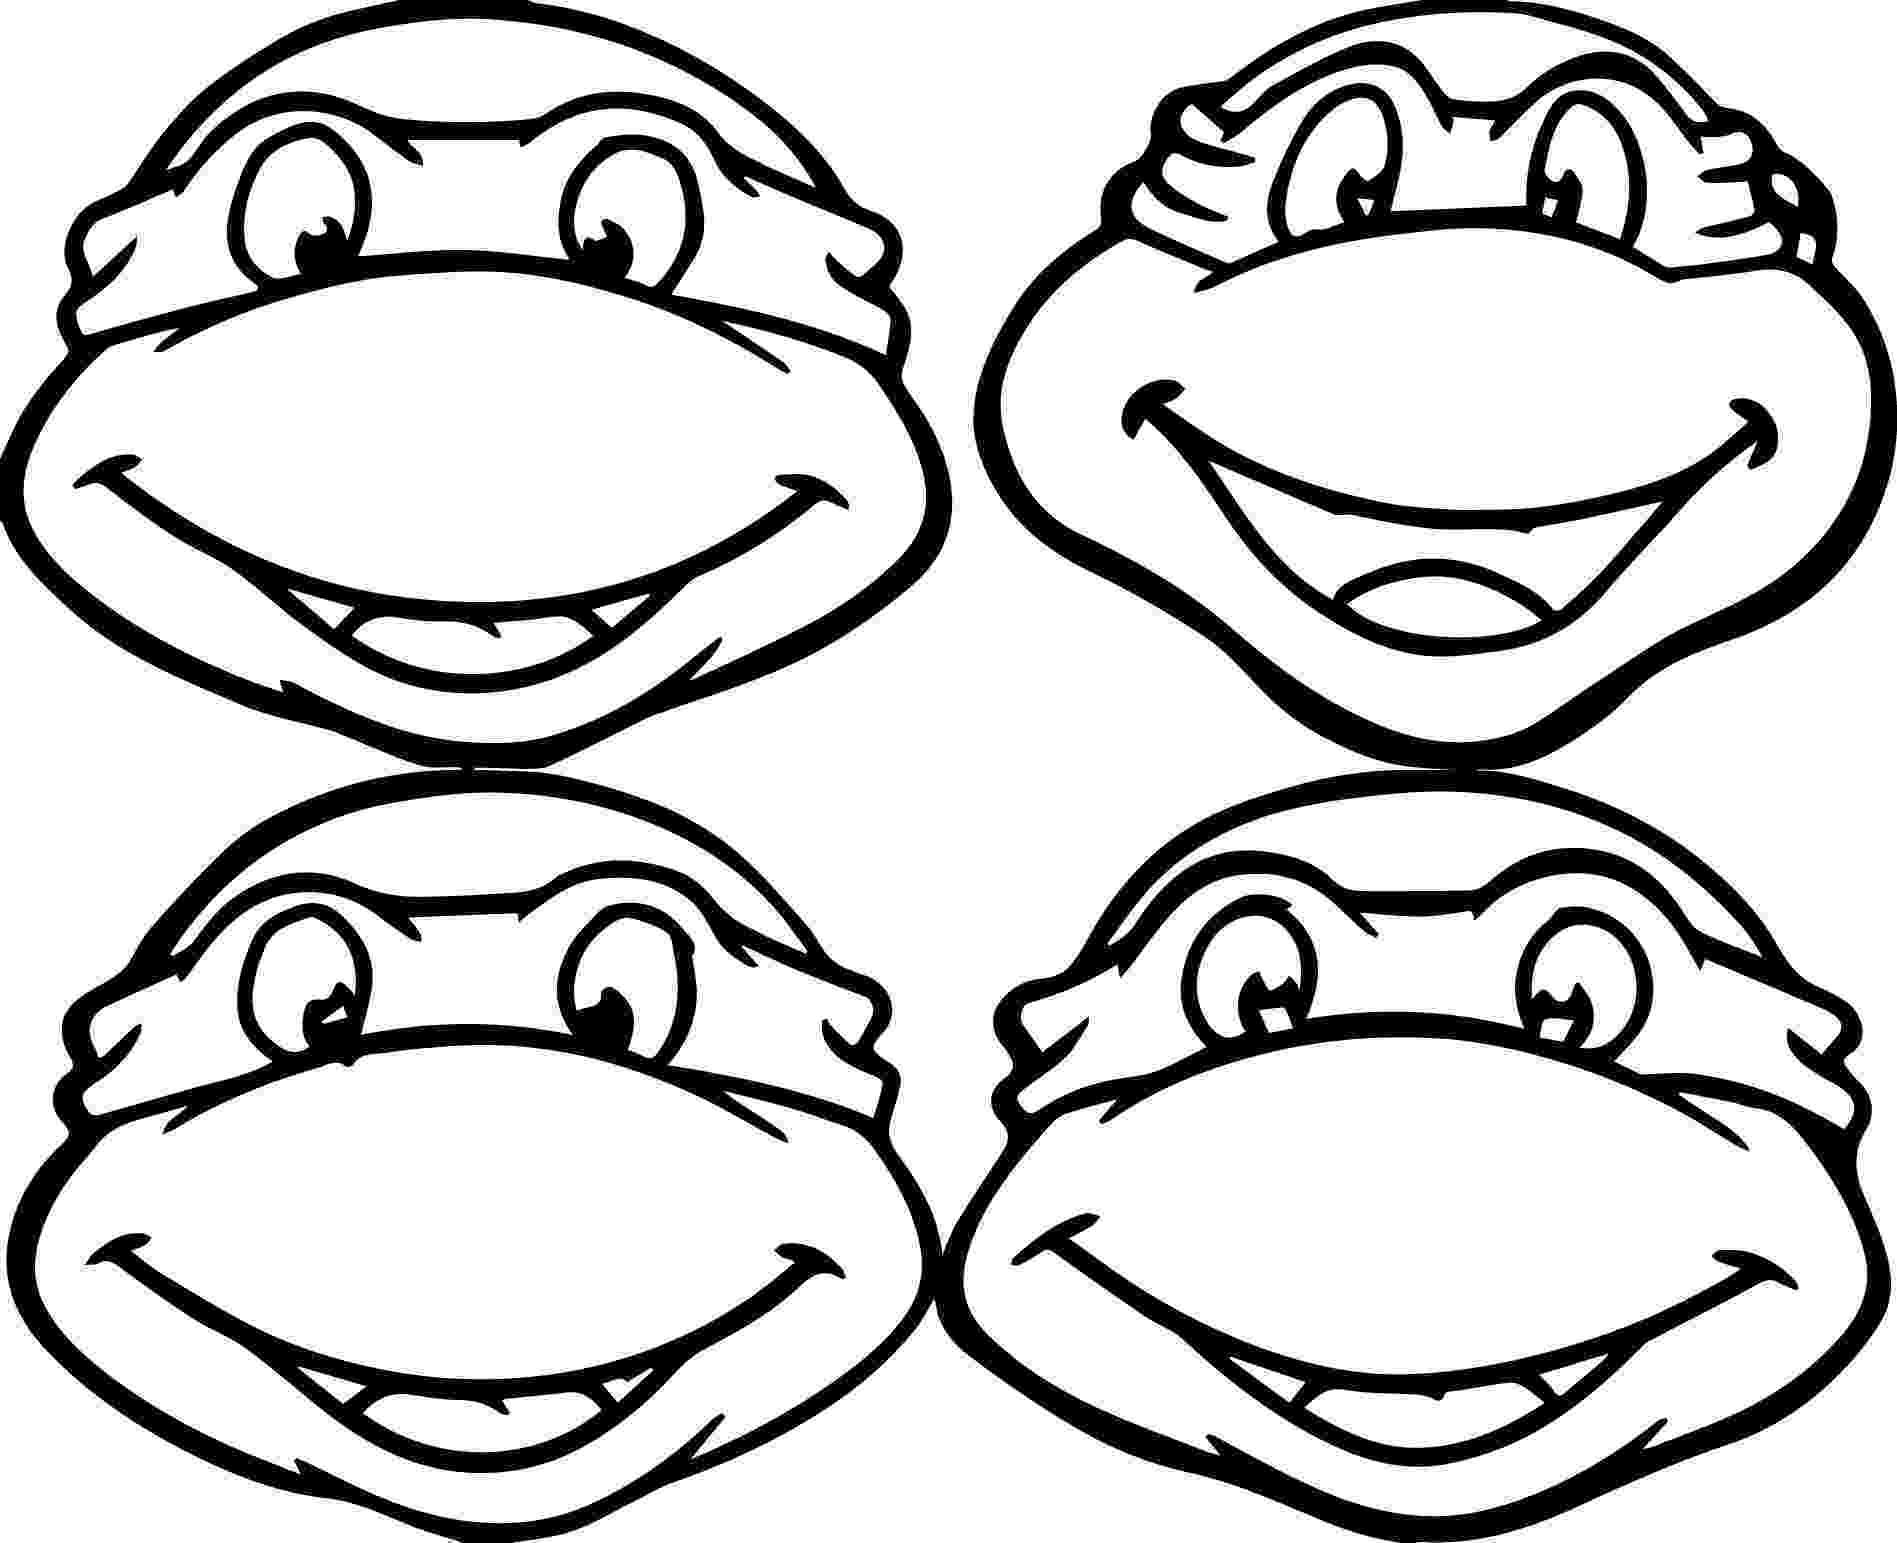 ninja turtle coloring page ninja turtles art coloring page turtle coloring pages page ninja turtle coloring